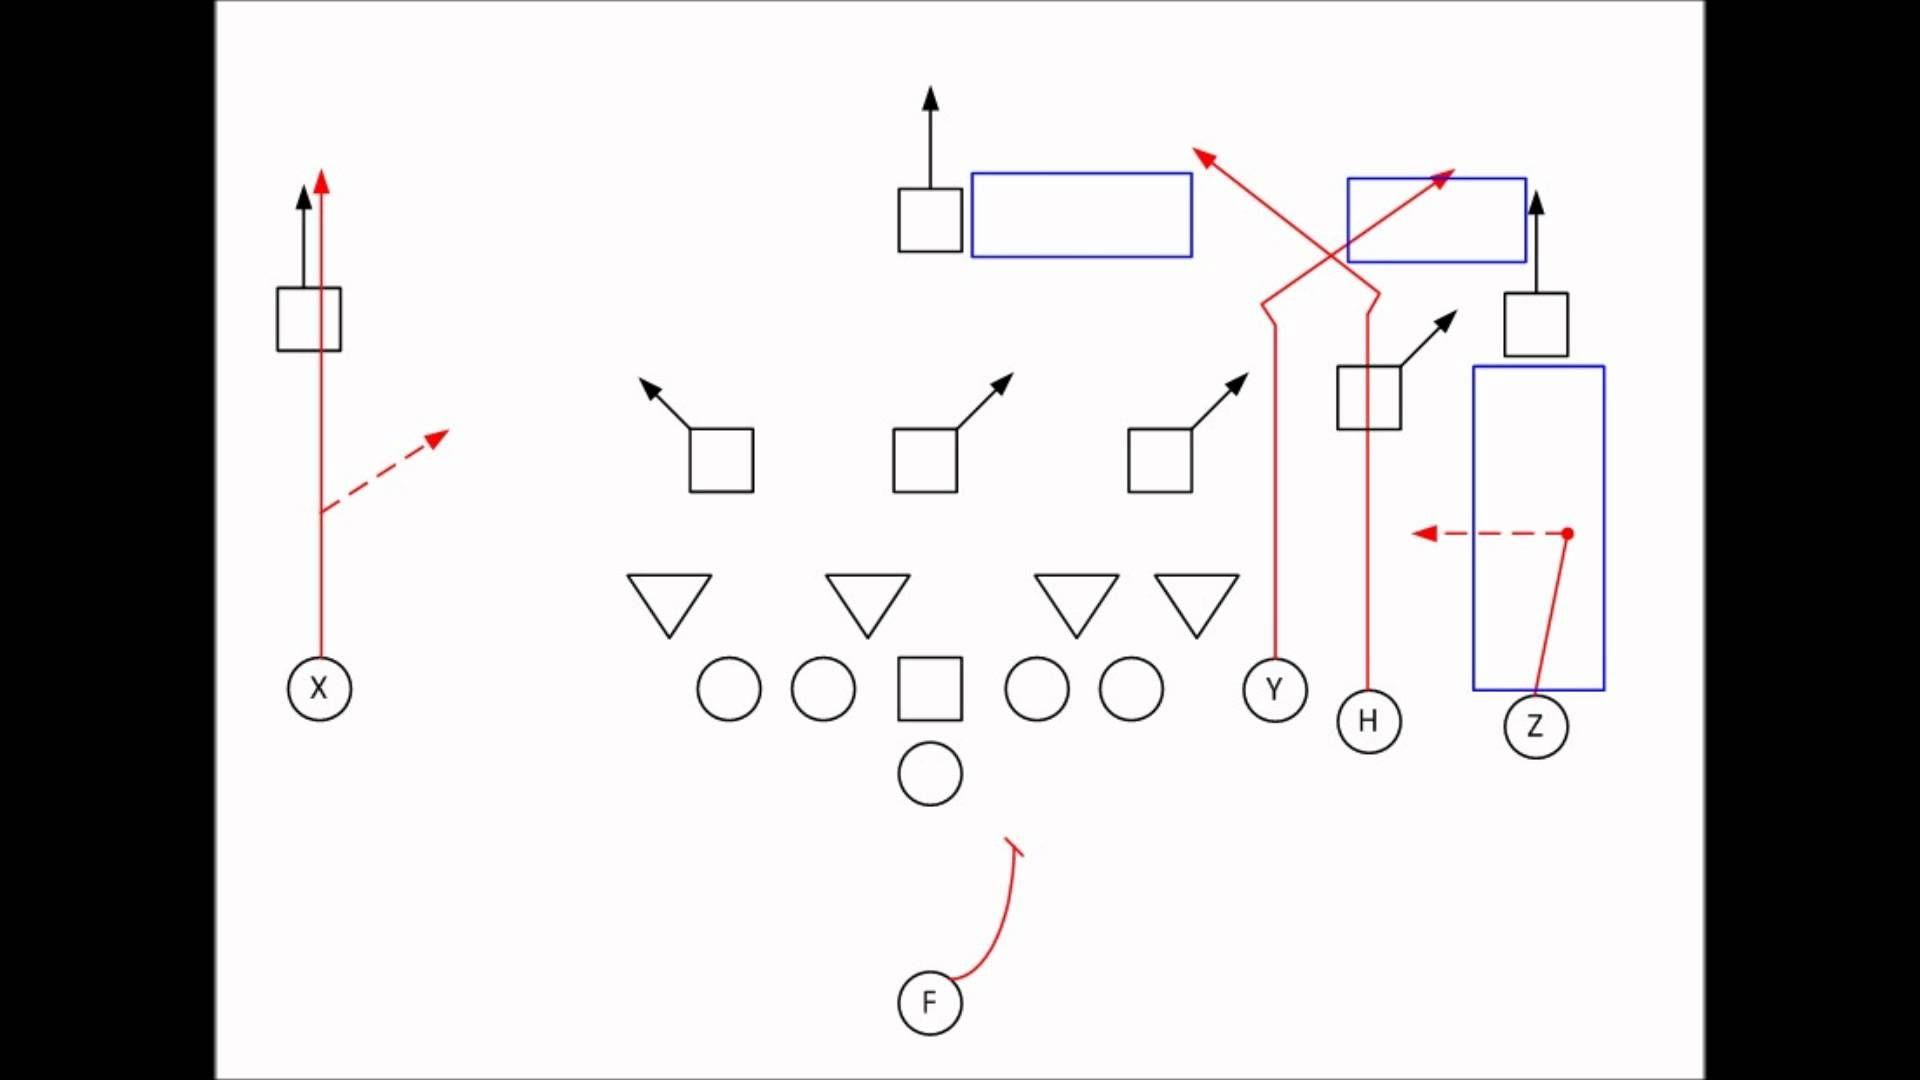 medium resolution of attacking the defense cover 3 vs smash concept